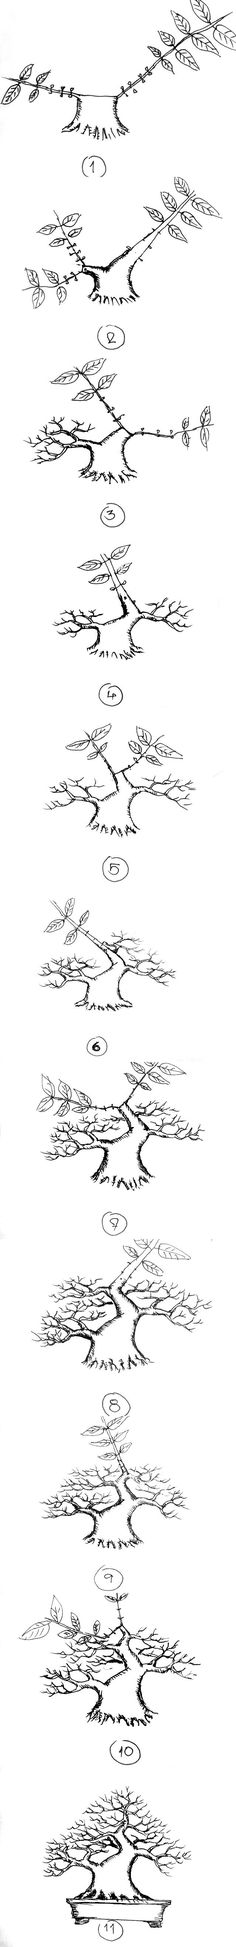 Bonsai evolution (original source: https://goo.gl/nhE7Ln):